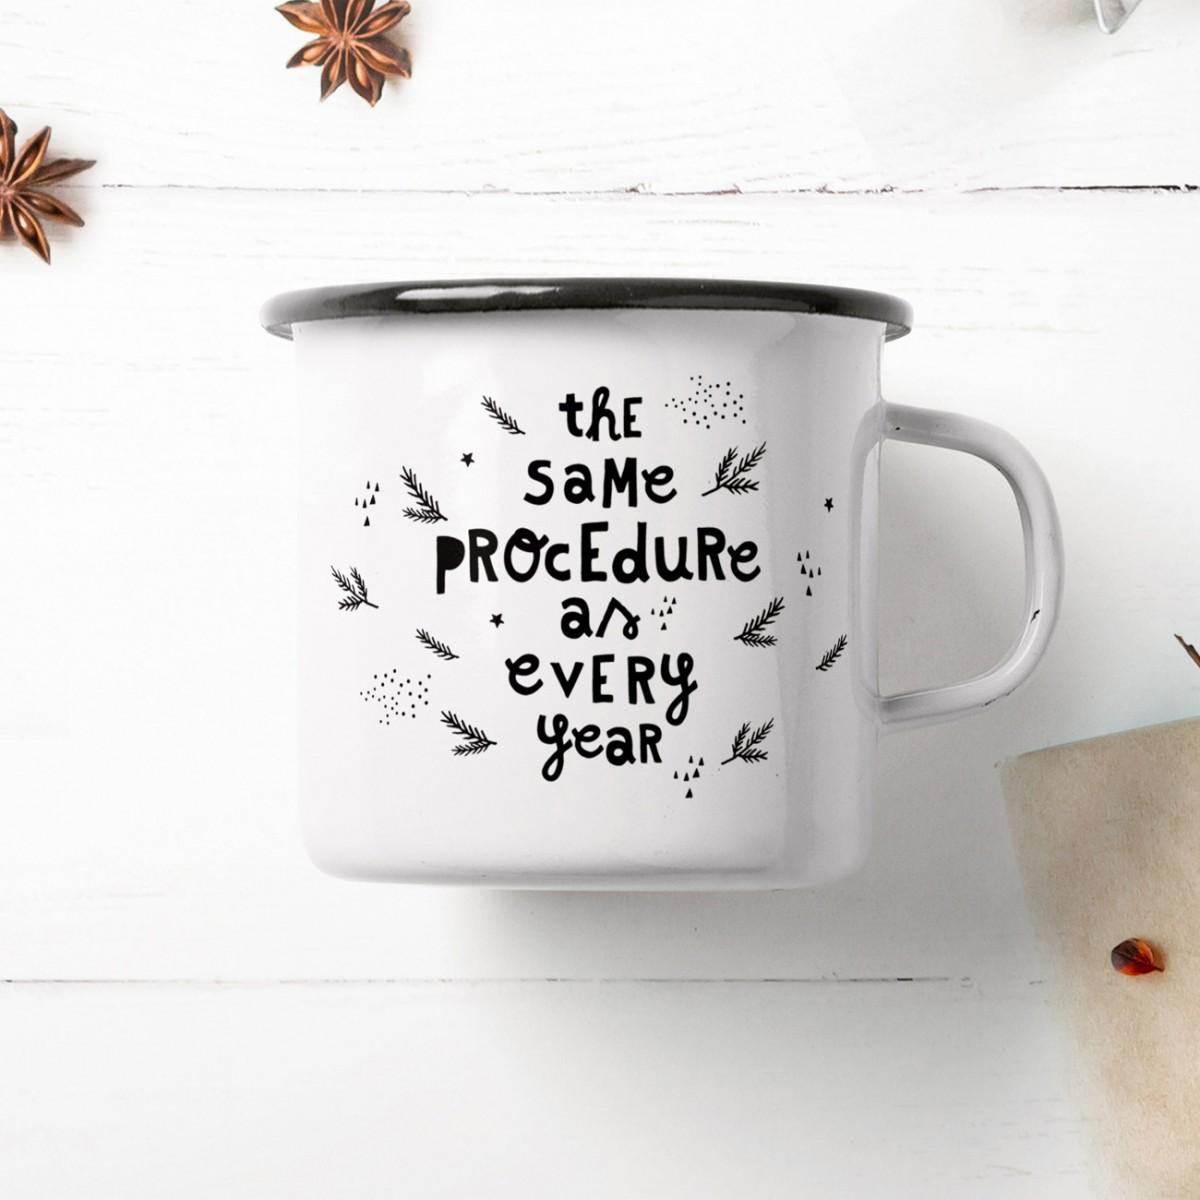 typealive / Emaillebecher Tasse / Procedure